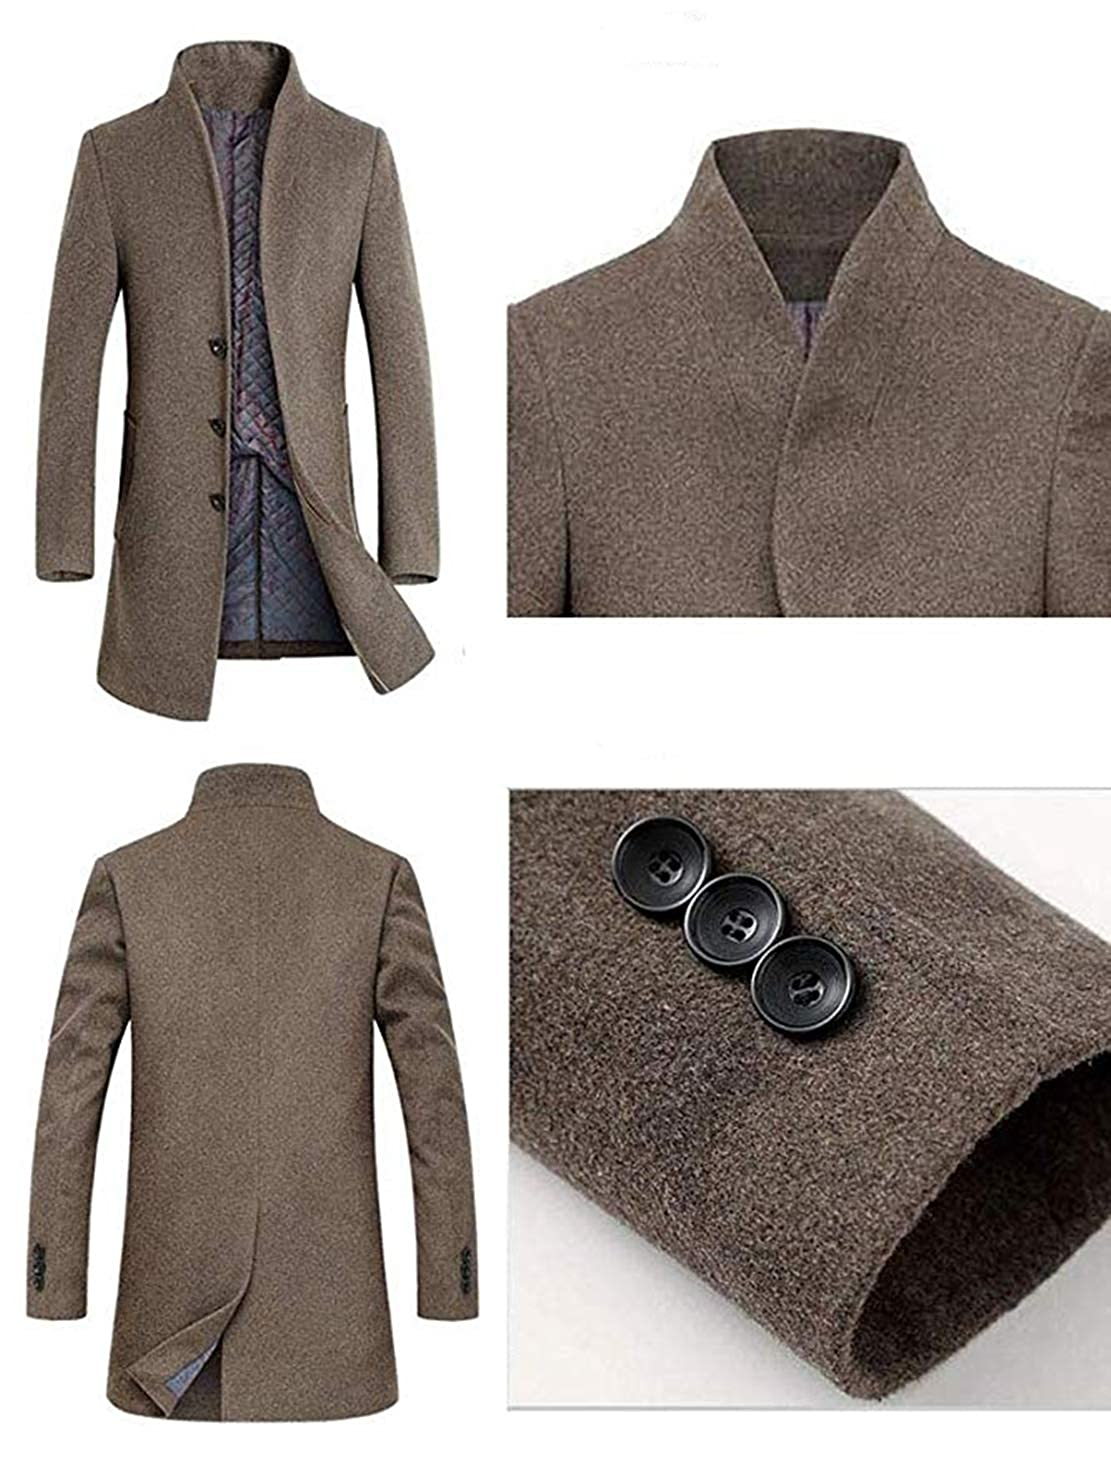 Mens Winter Stylish Wool Trench Coat Business Slim Fit Long Peacoat Top Coat